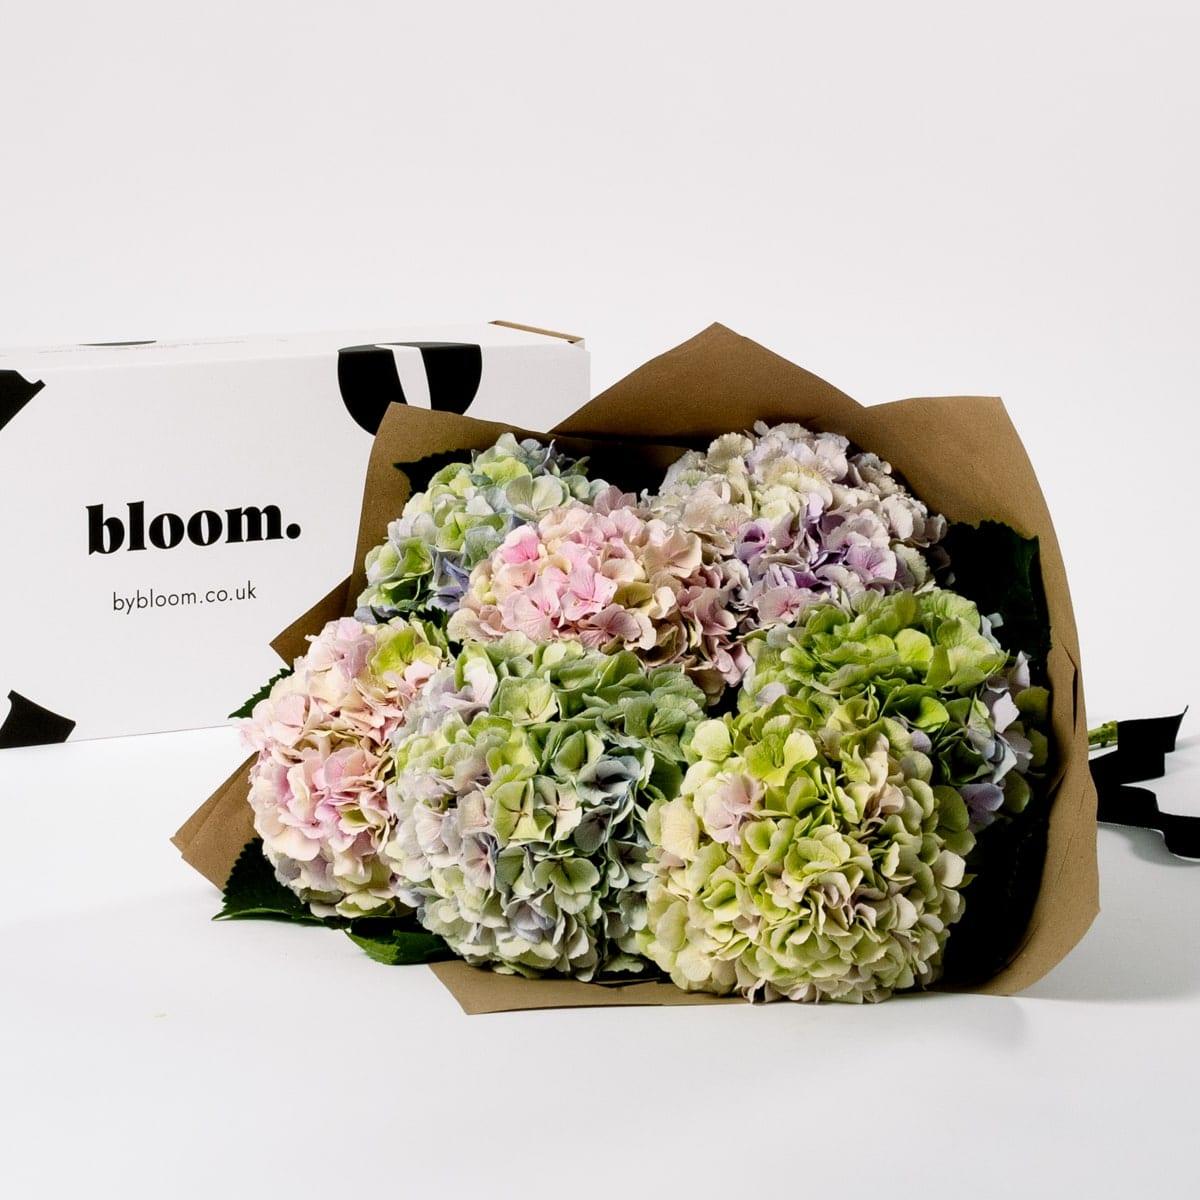 Bloom Flower Delivery | Pastel Mix Hydrangea